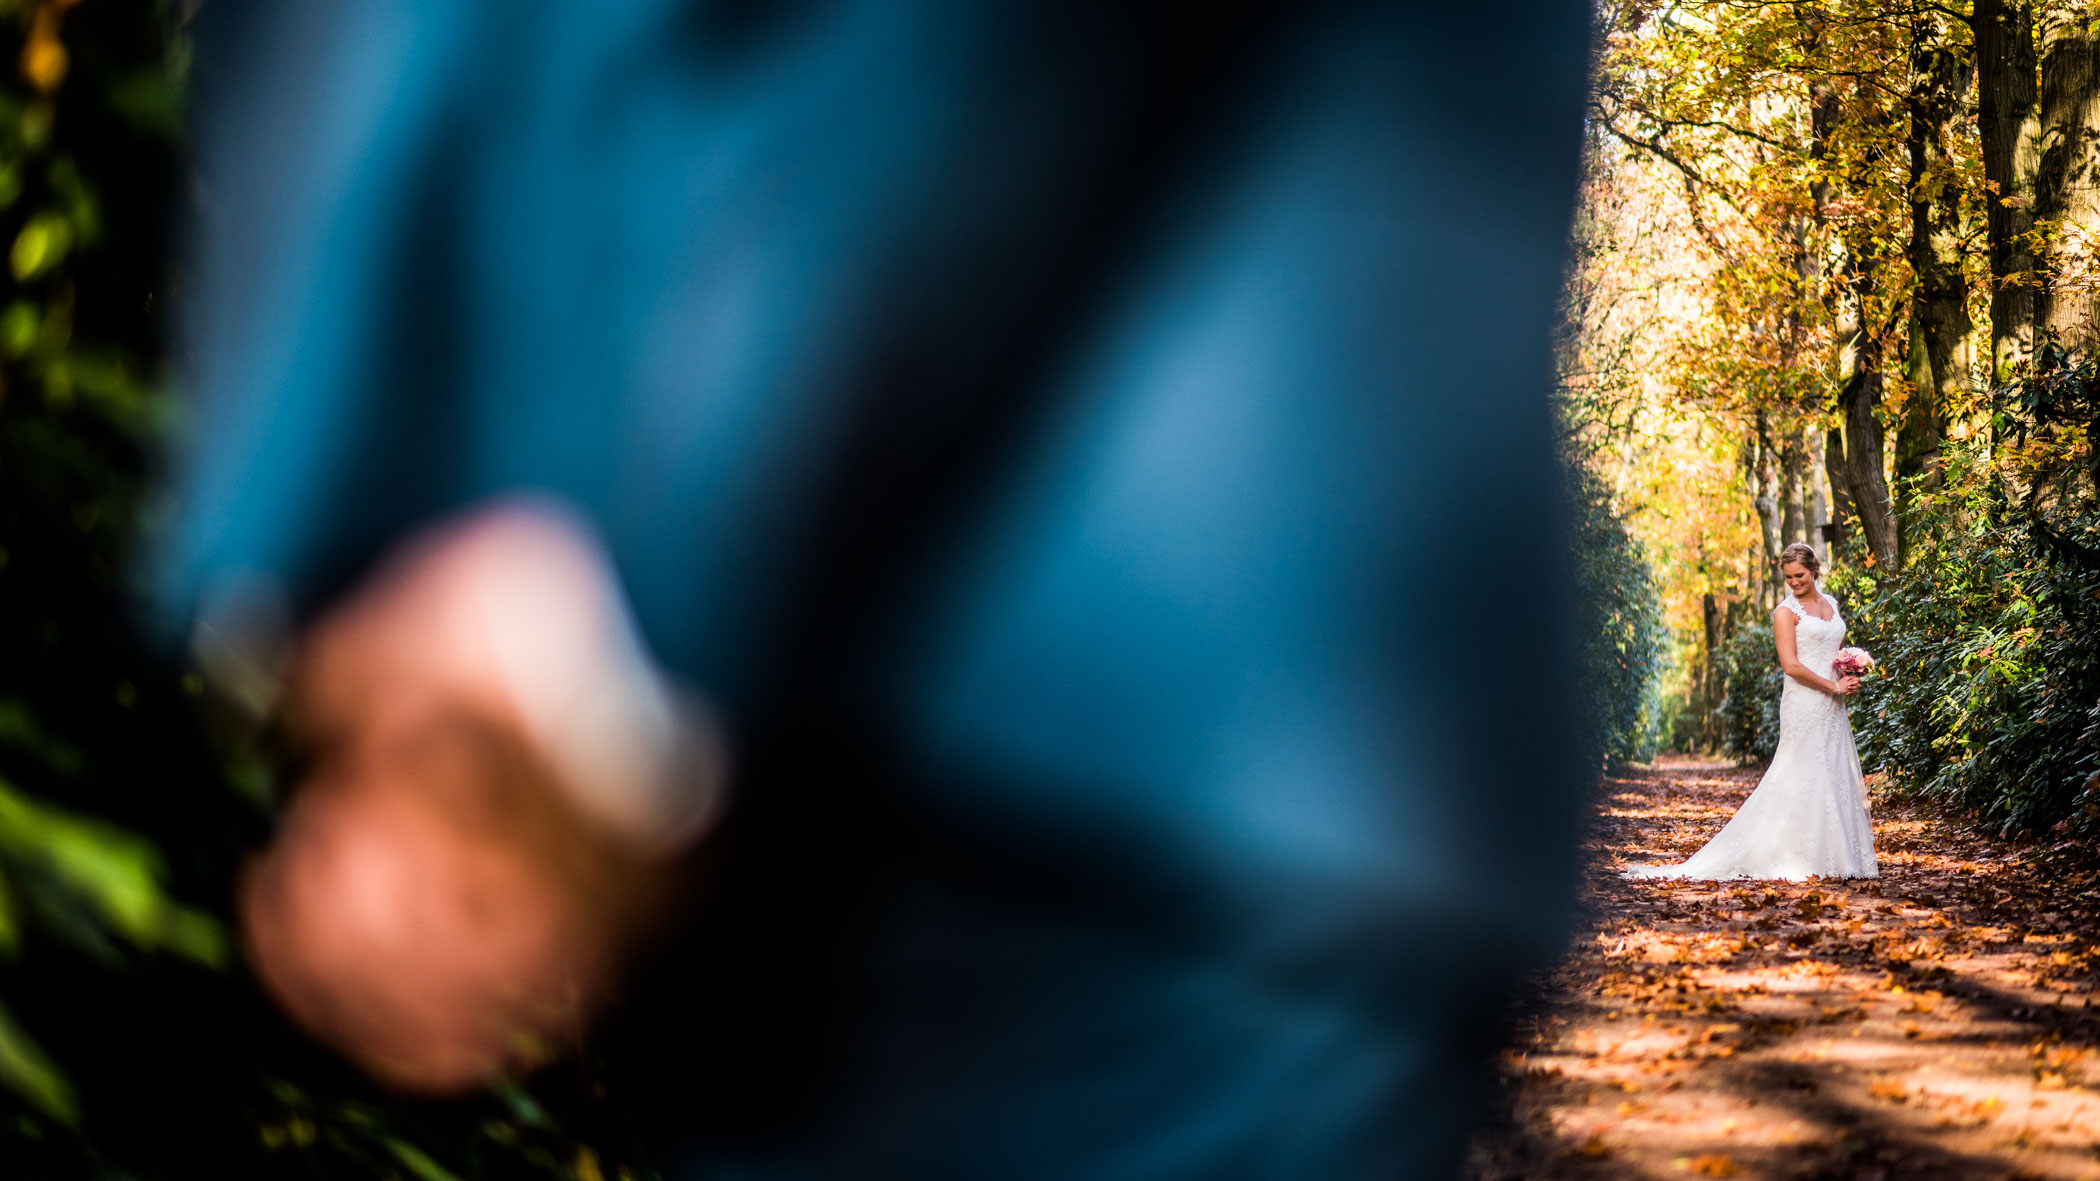 bruidsfotograaf in Arboretum Poort Bulten